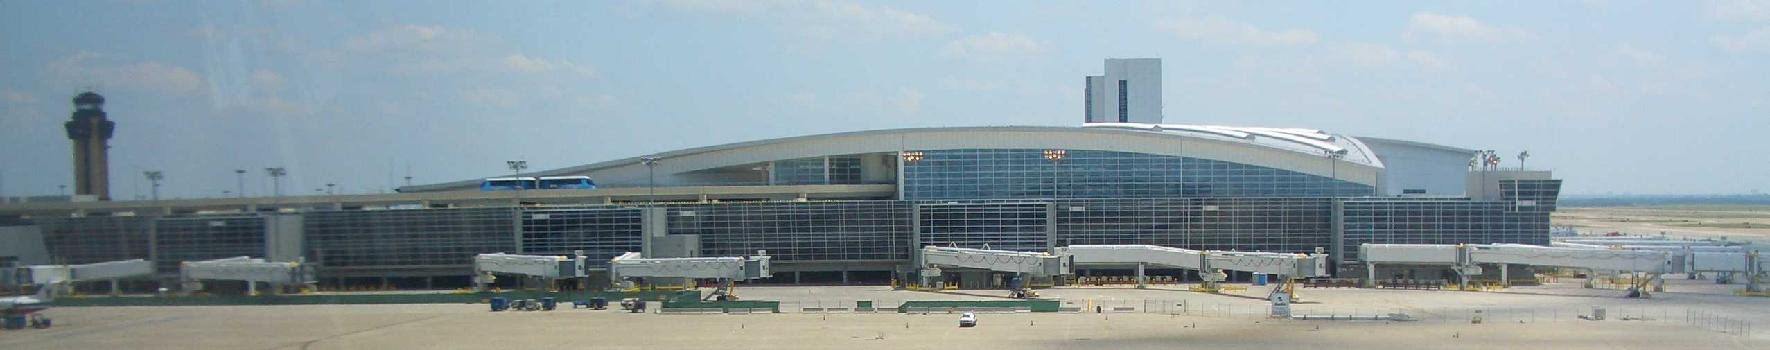 Dallas-Fort Worth International Airport